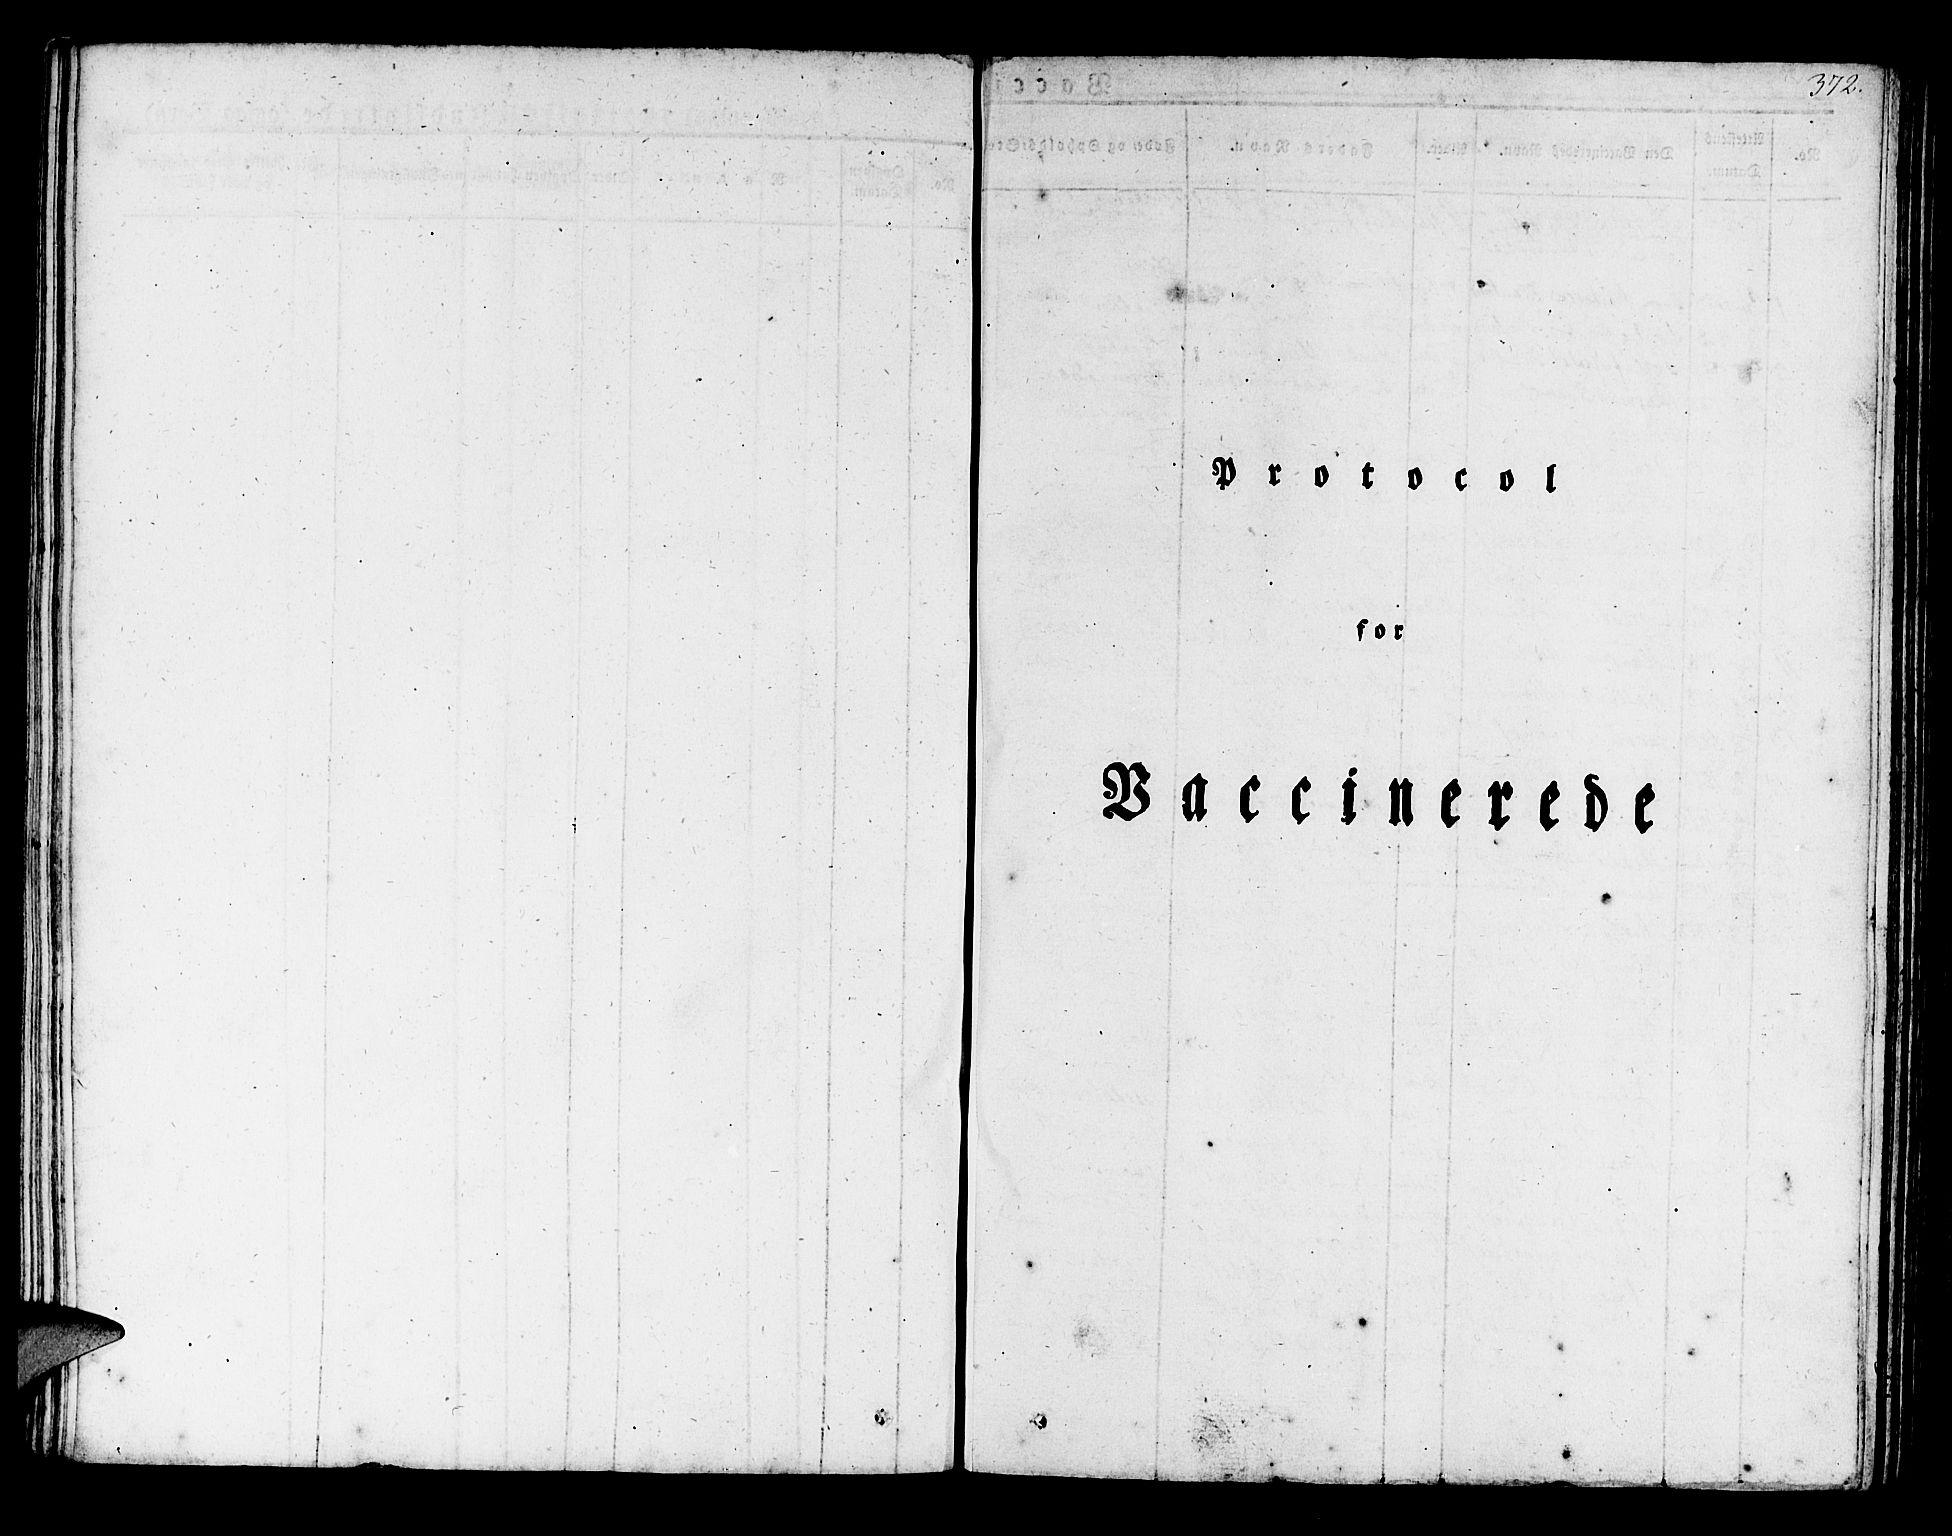 SAB, Manger sokneprestembete, H/Haa: Ministerialbok nr. A 4, 1824-1838, s. 372